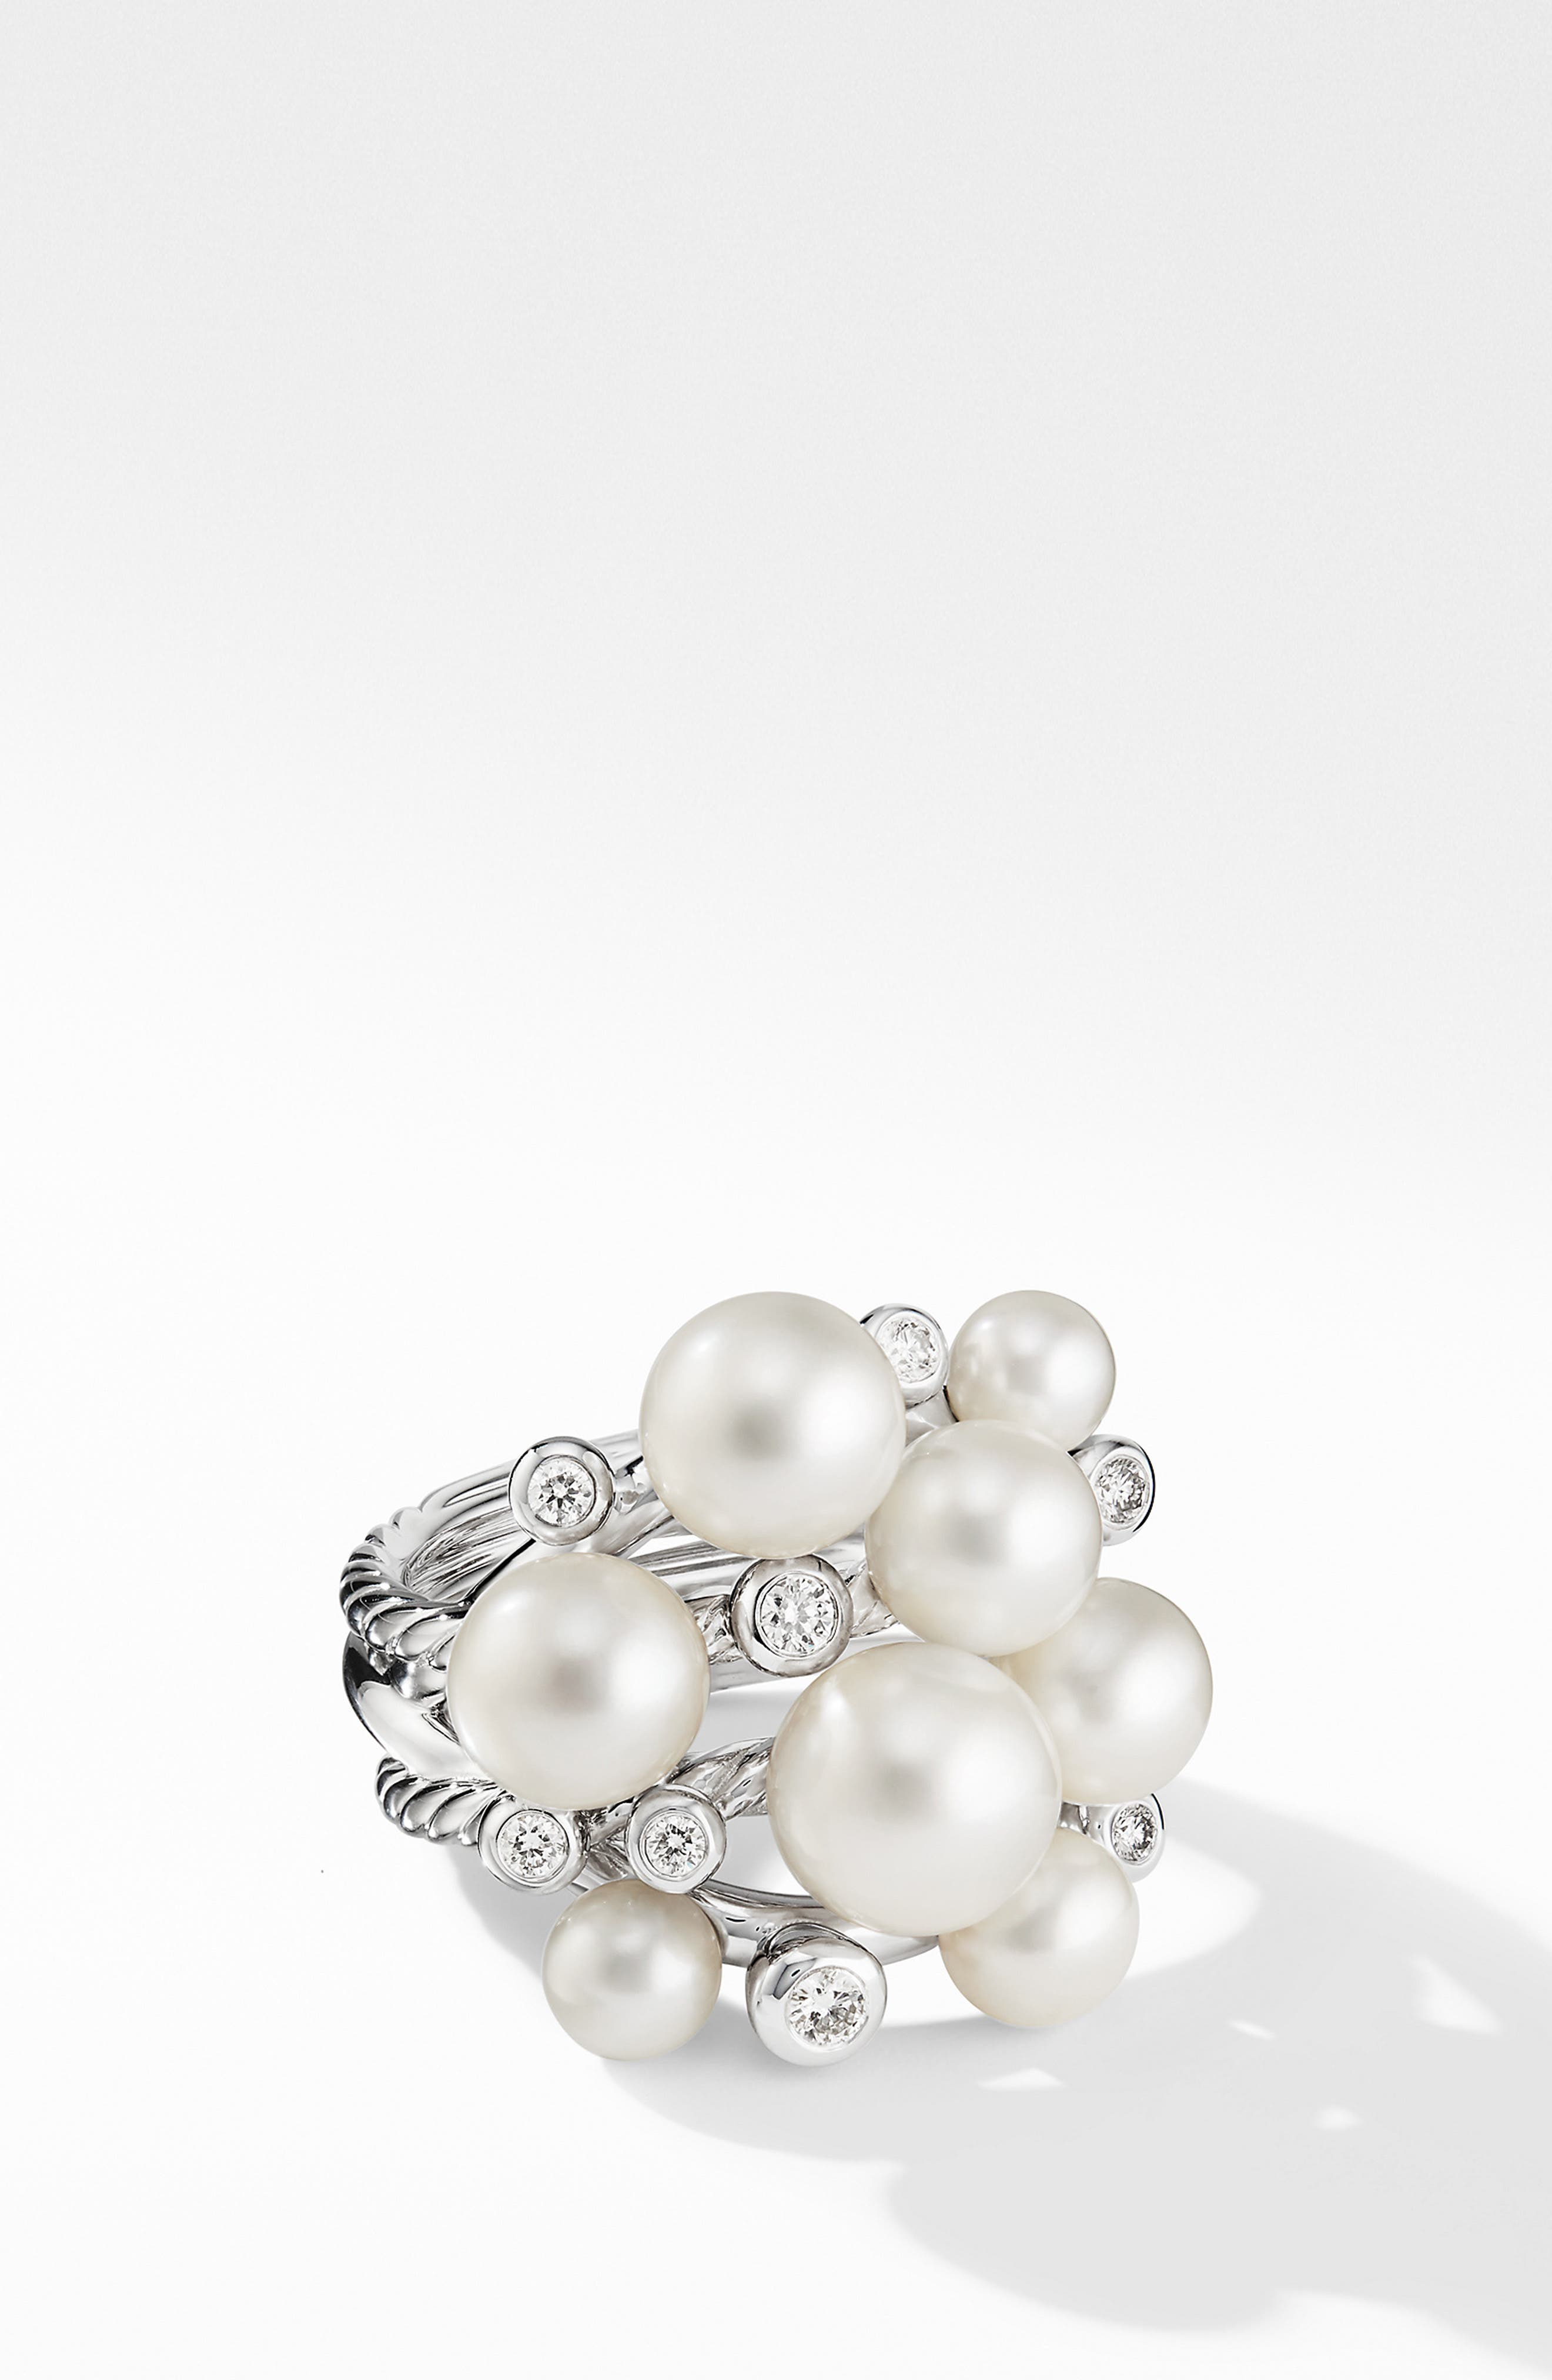 DAVID YURMAN Large Pearl Cluster Ring with Diamonds, Main, color, SILVER/ DIAMOND/ PEARL